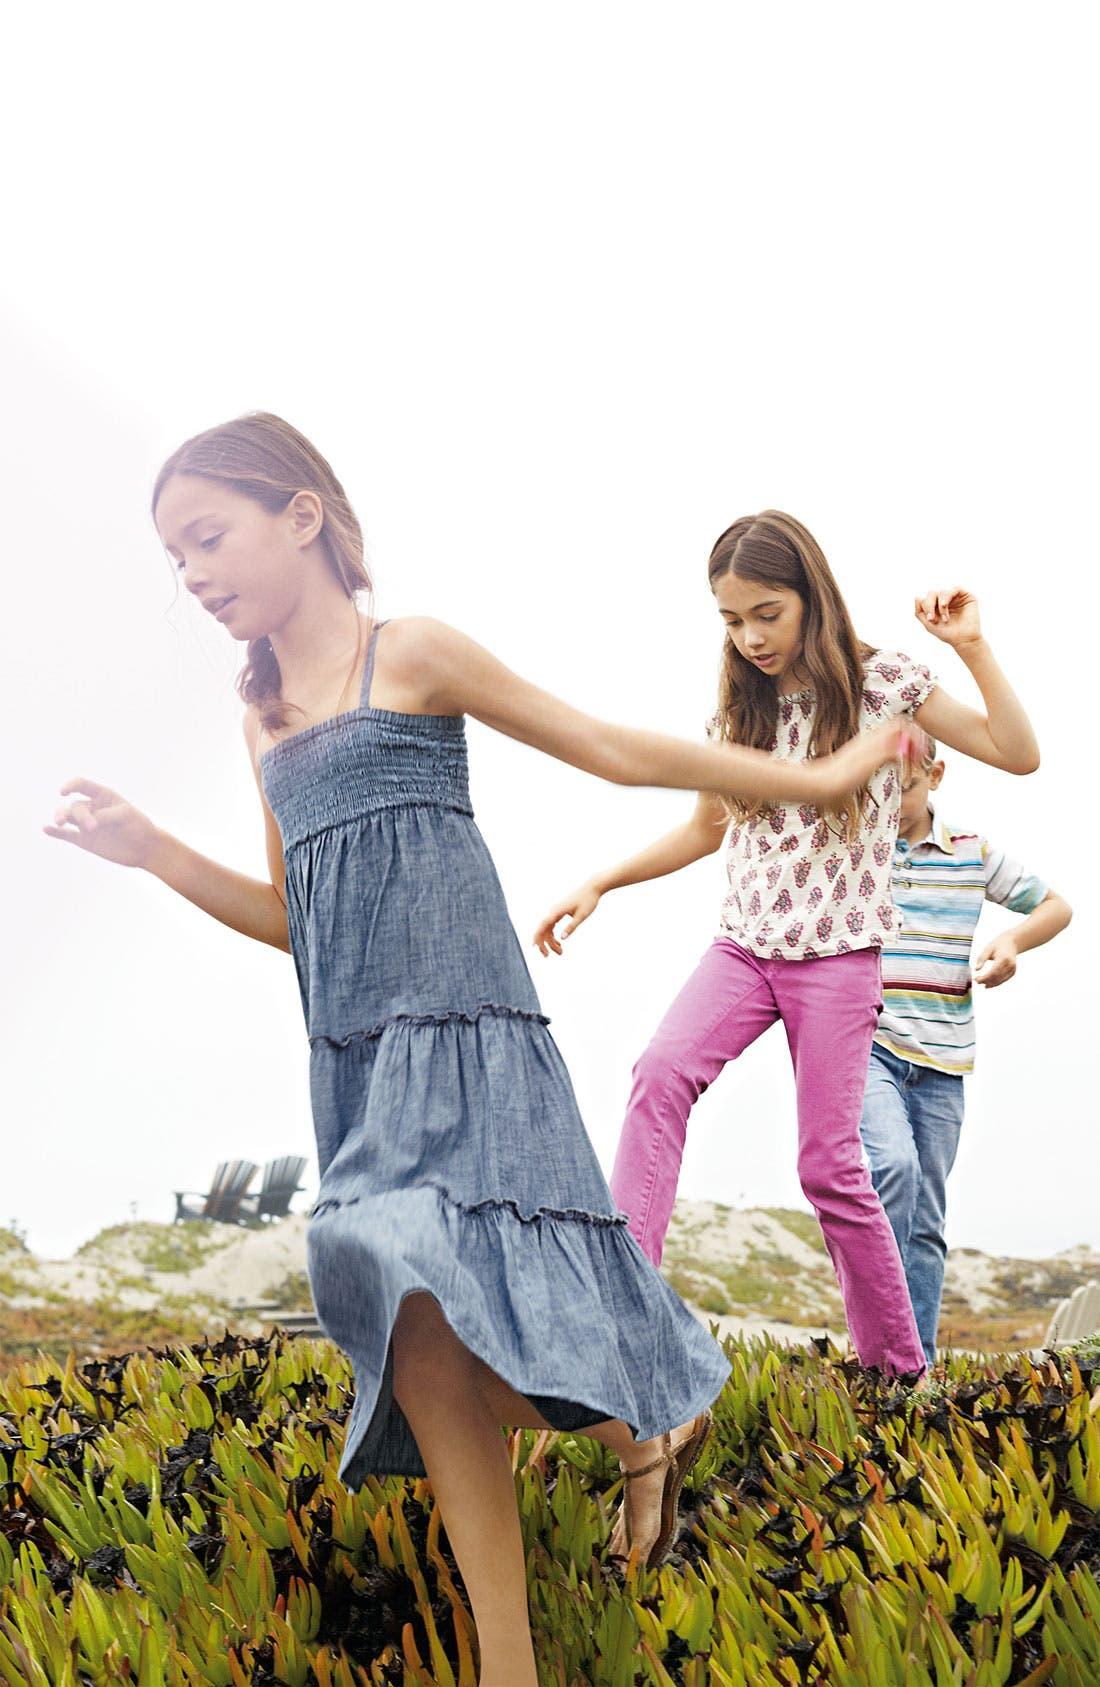 Alternate Image 2  - Peek 'Alise' Top (Toddler, Little Girls & Big Girls)